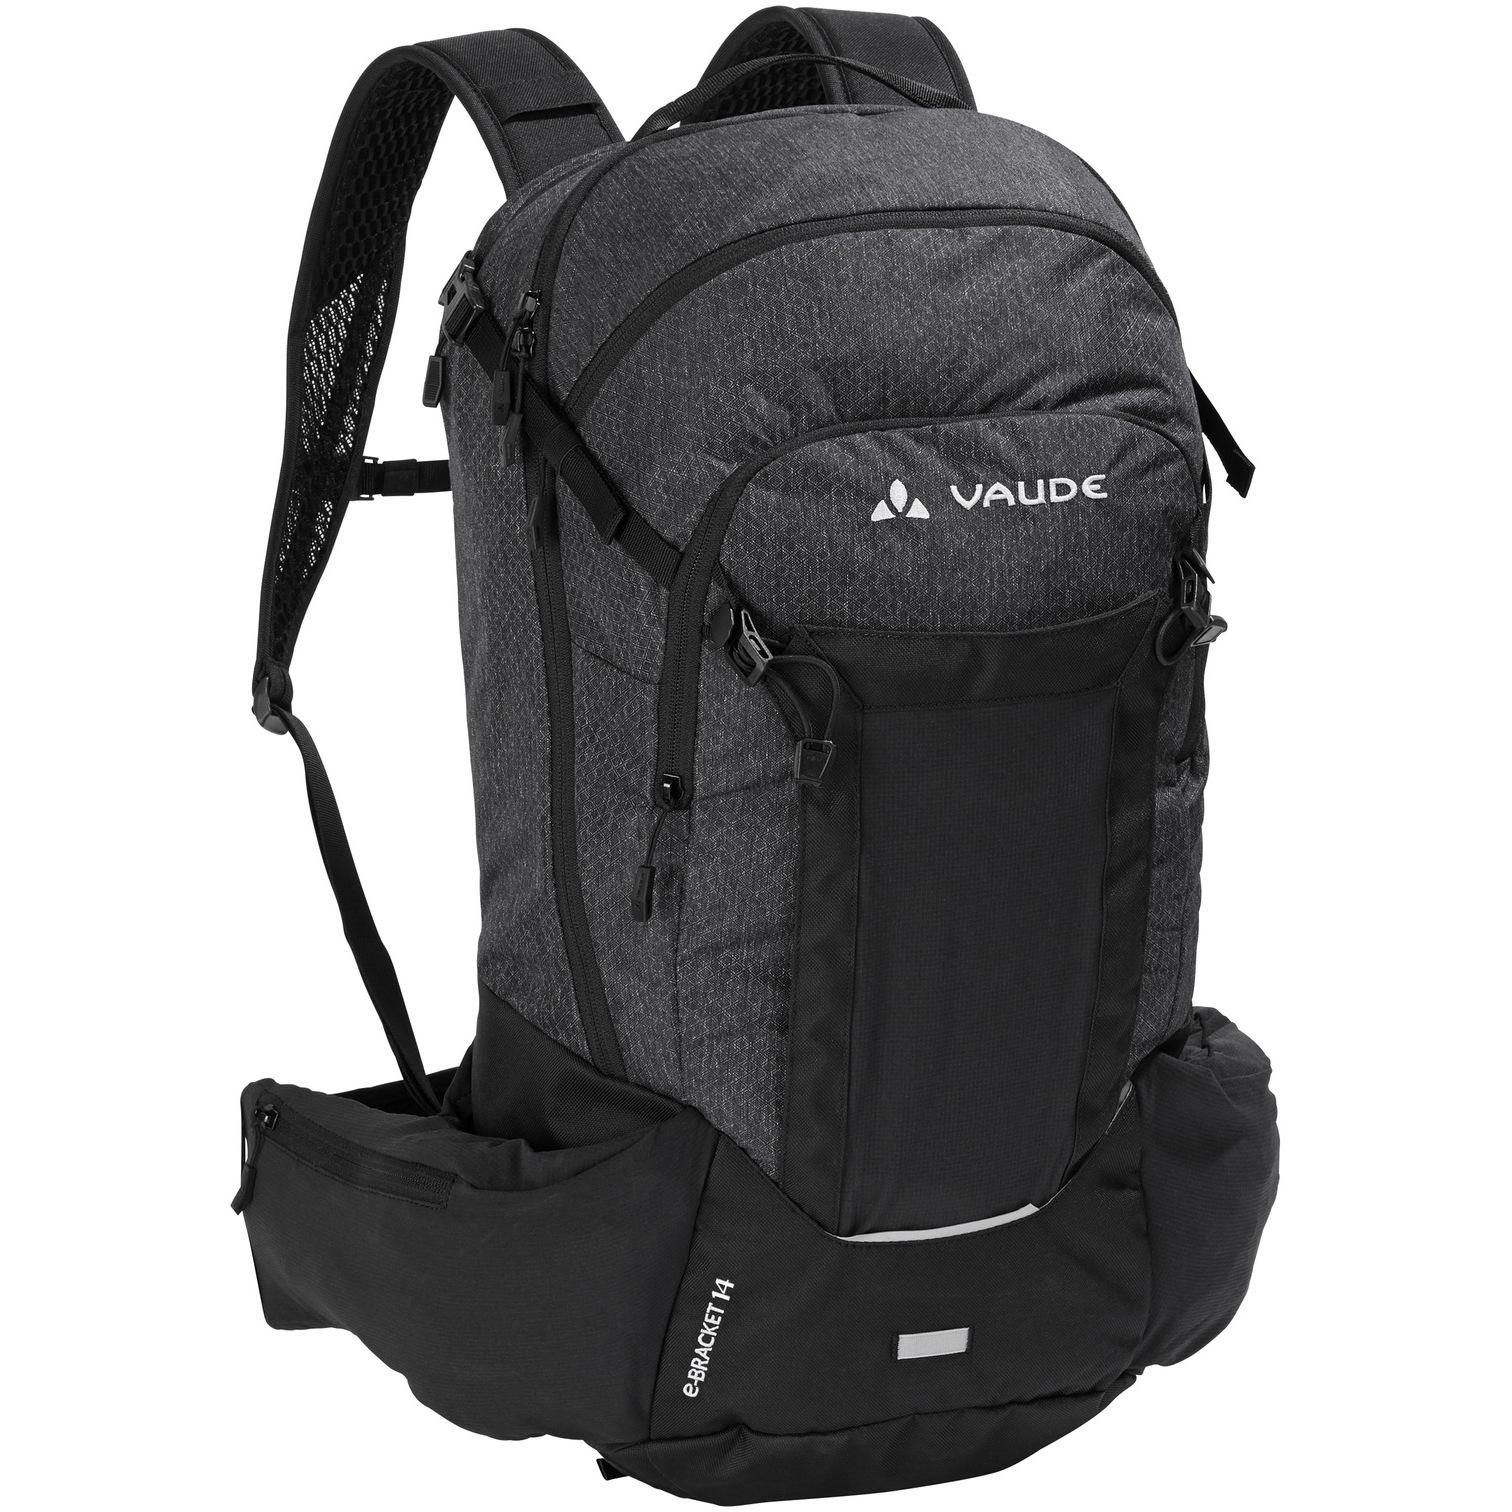 Vaude eBracket 14 Backpack - black